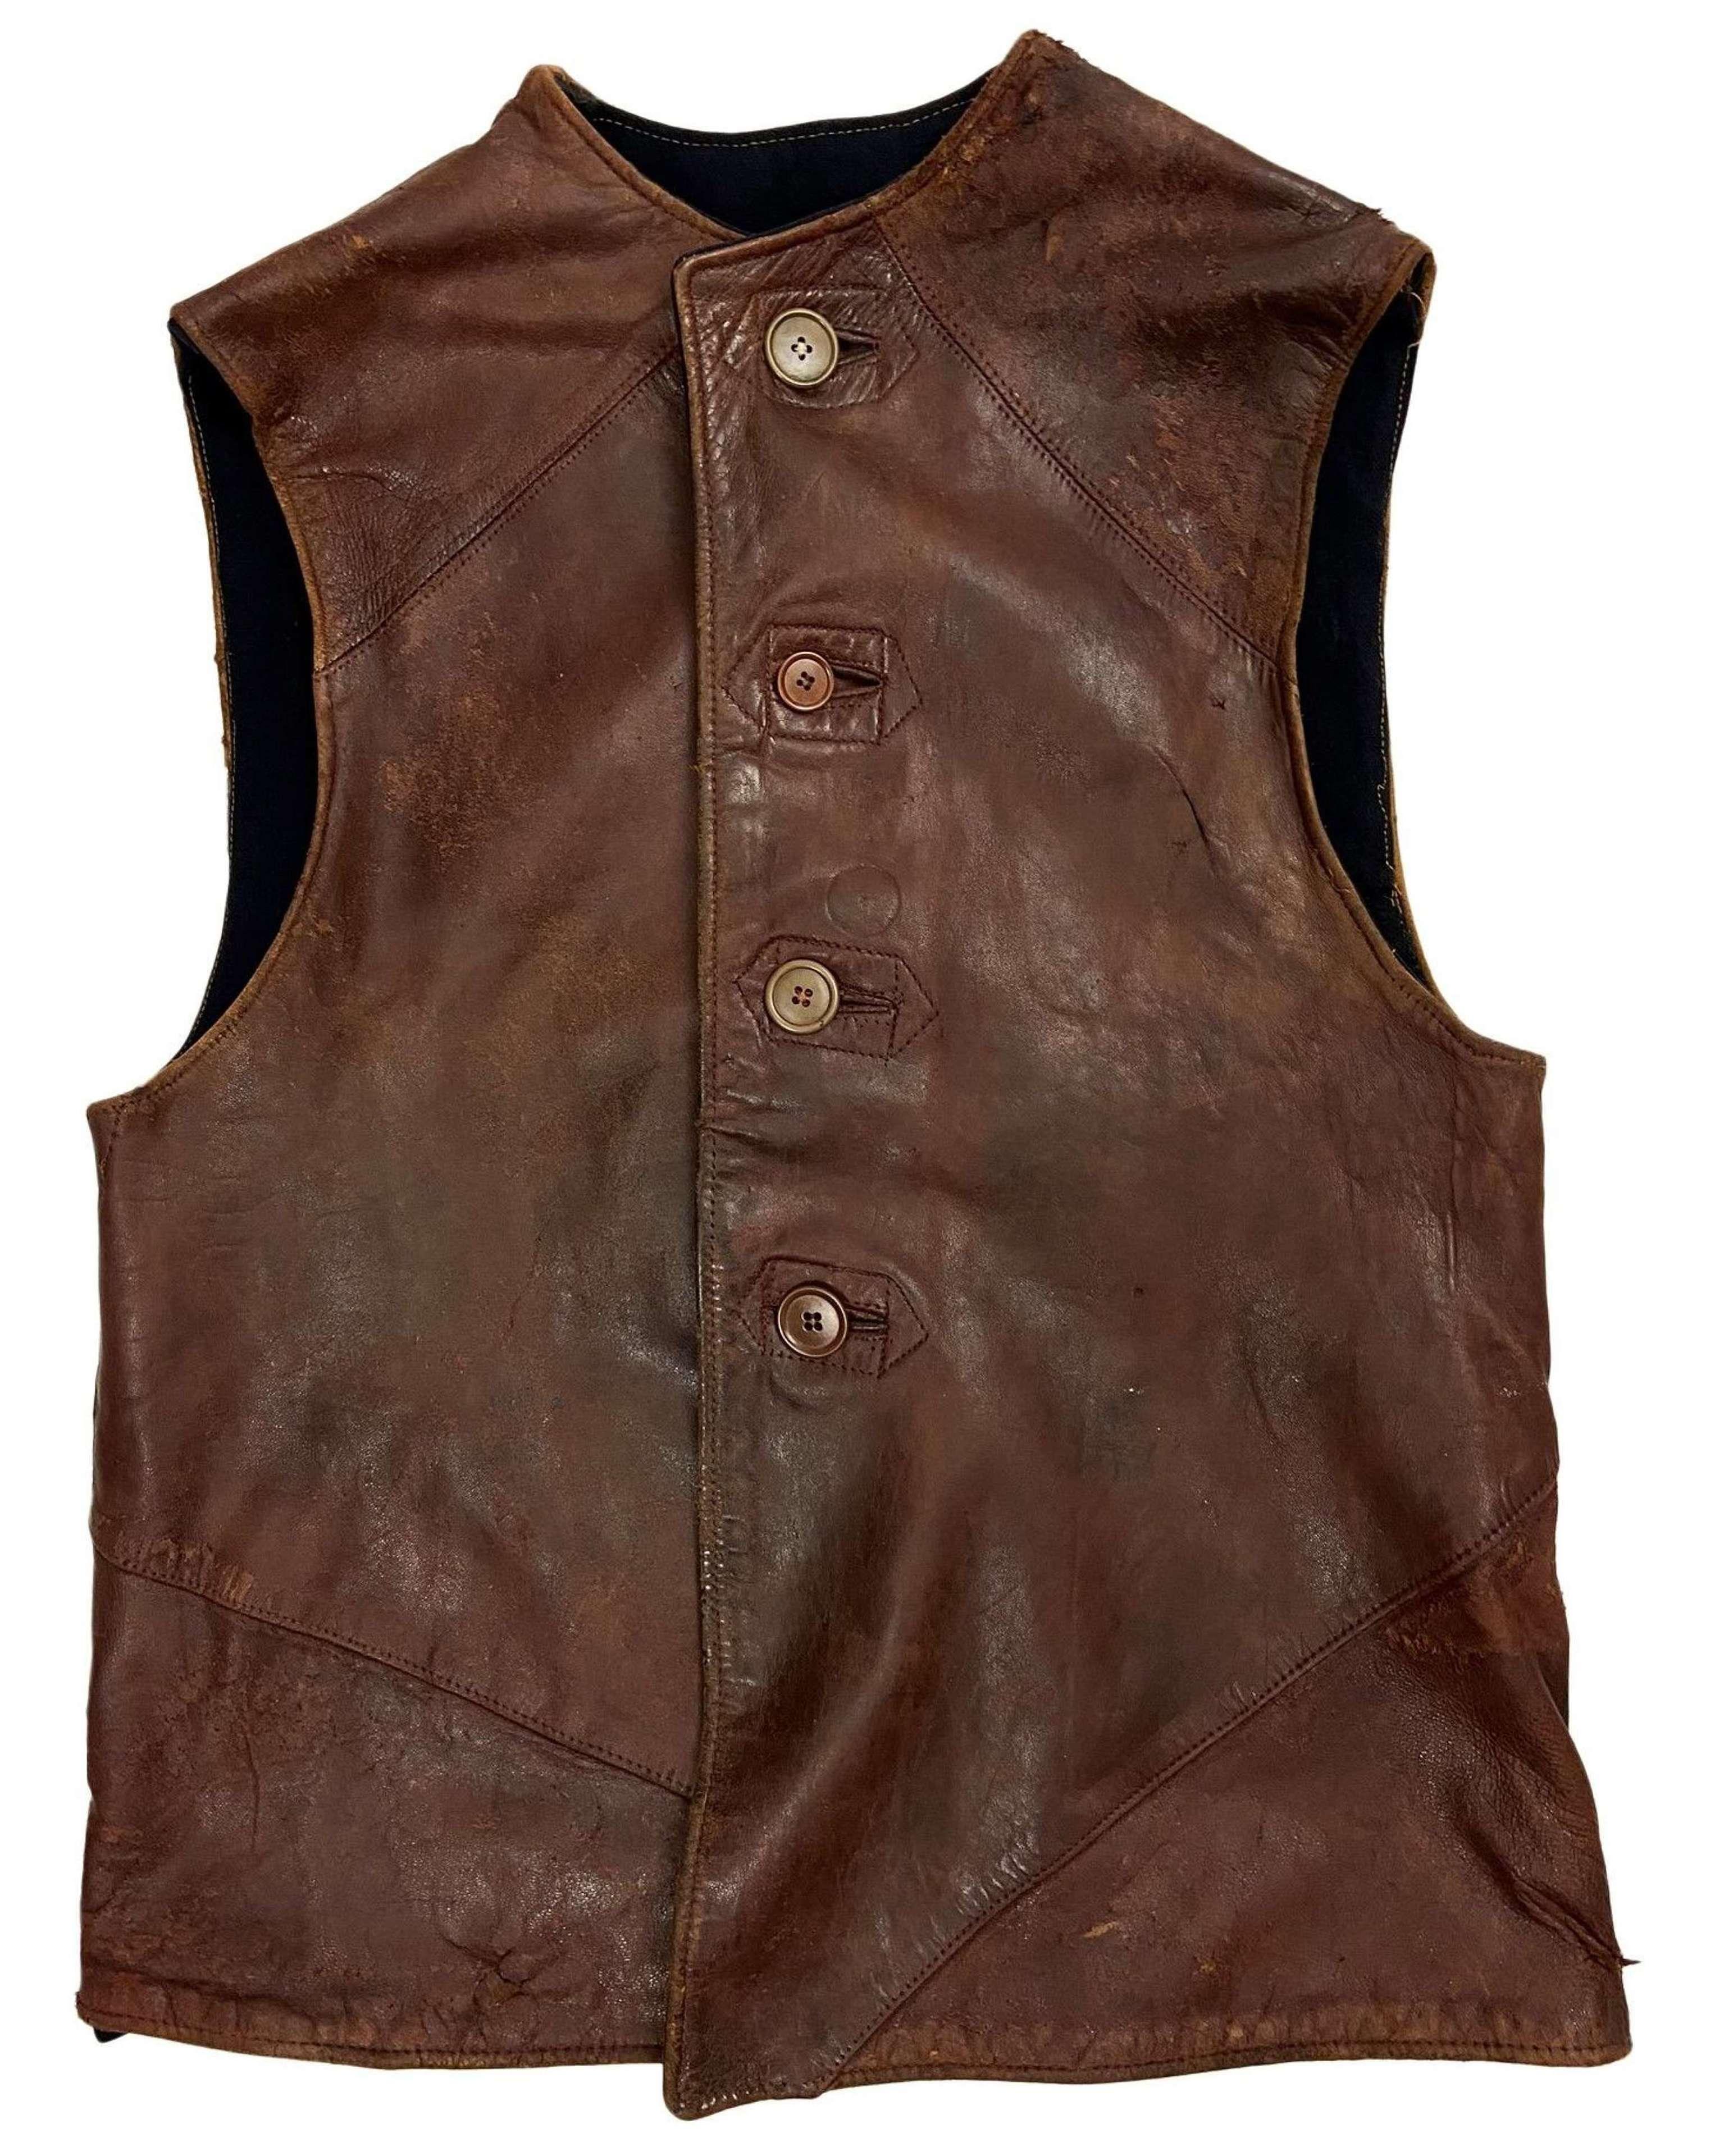 Original 1940s British Leather Jerkin - Dark Lining